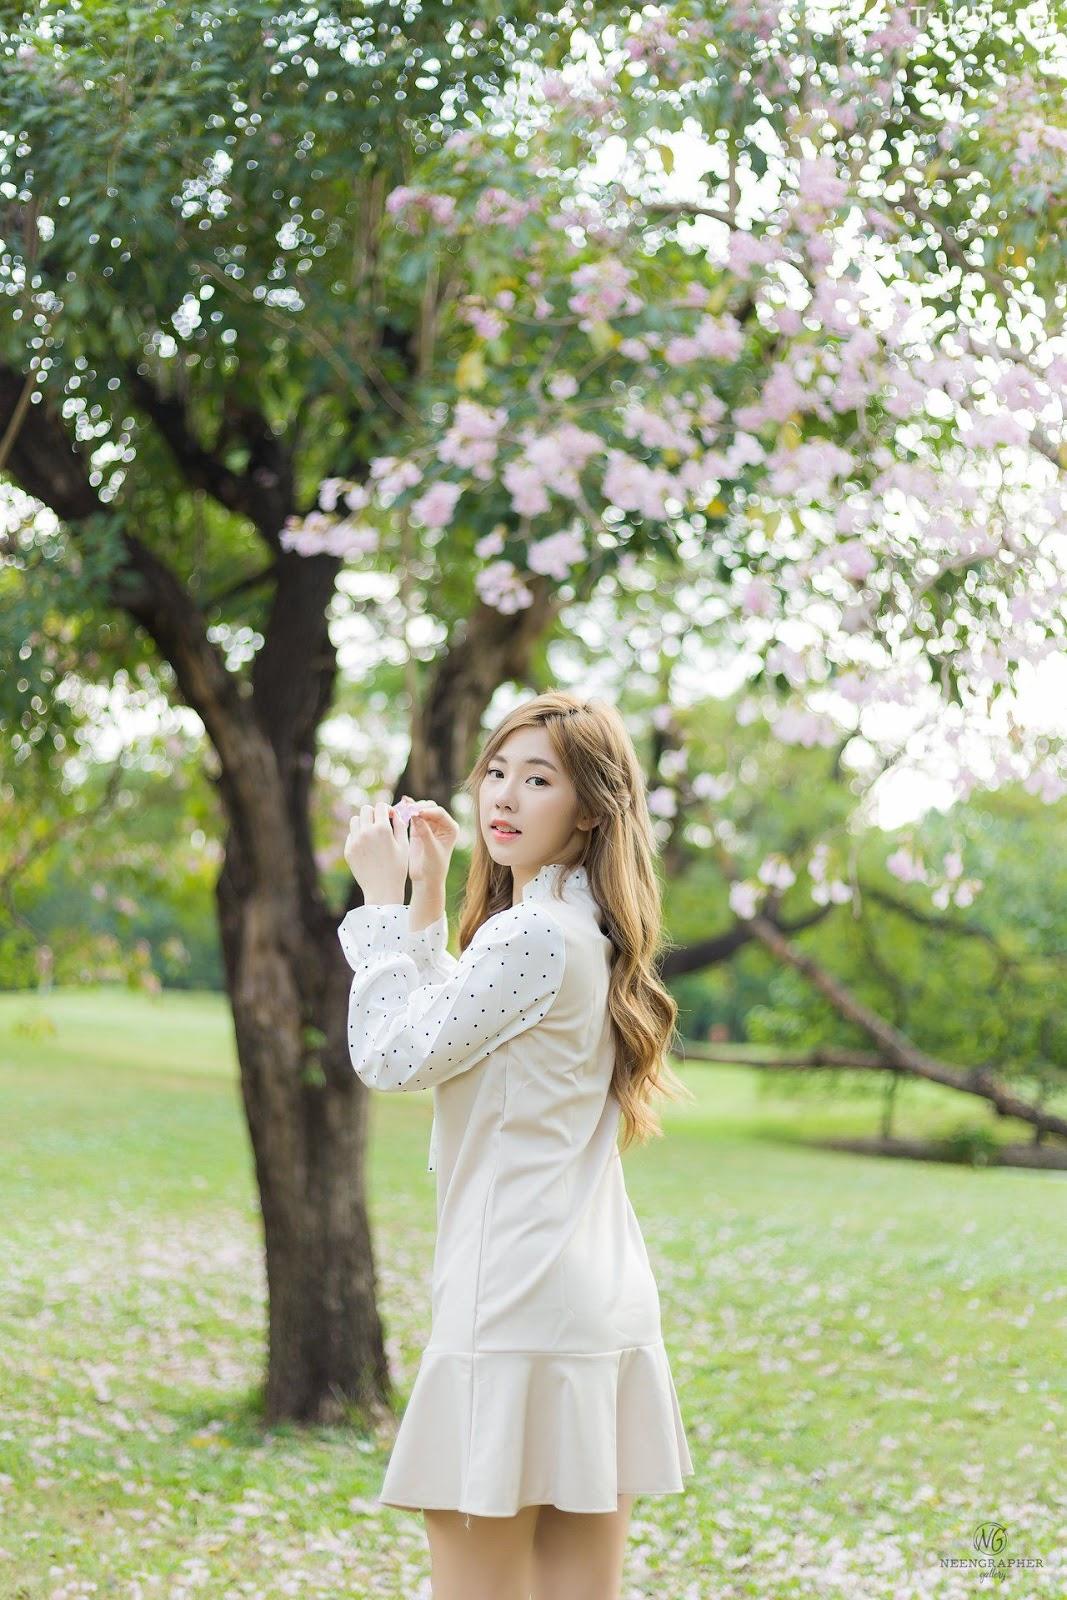 Thailand cute model Nilawan Iamchuasawad - Beautiful girl in the flower field - Photo by จิตรทิวัส จั่นระยับ - Picture 10